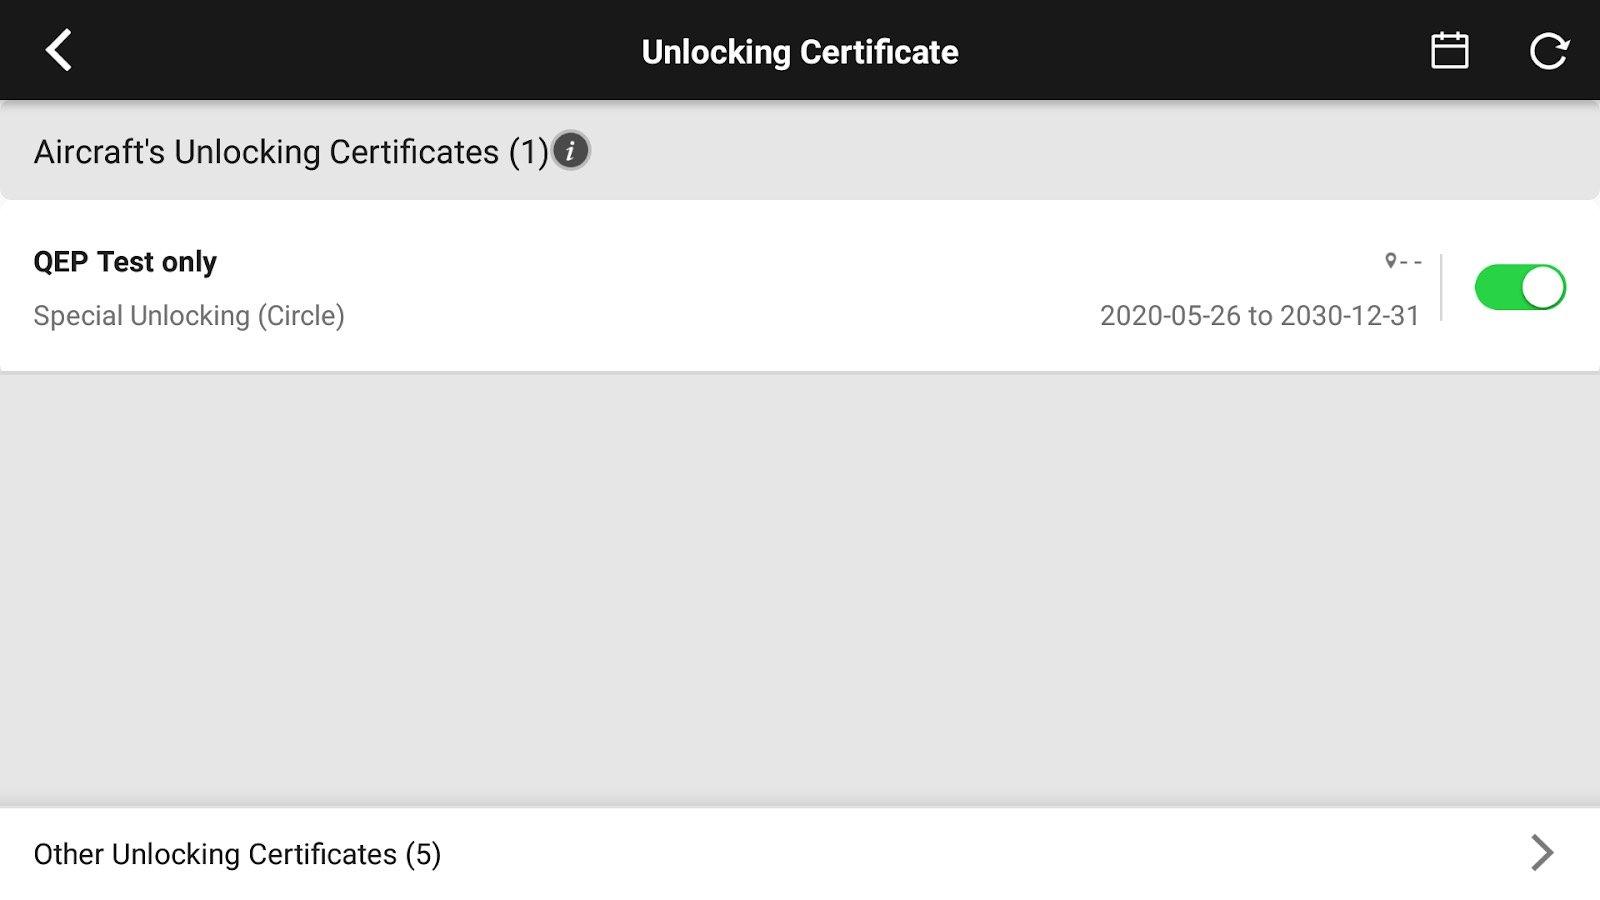 Downloading and Enabling Certificates Tutorial 5